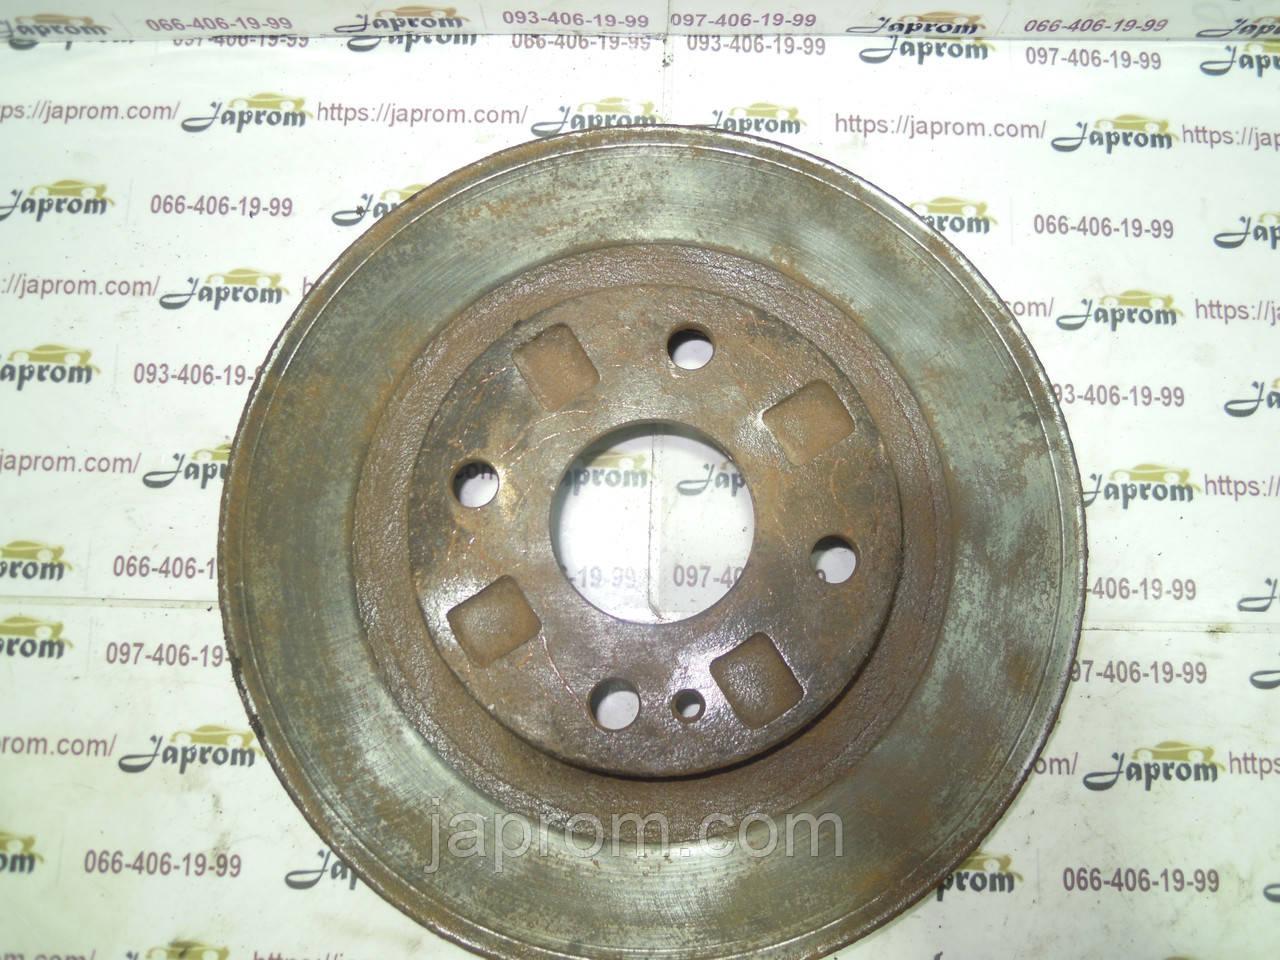 Тормозной диск передний Mazda 323 BJ 1997-2002г.в. 1.8 + 2.0 бензин